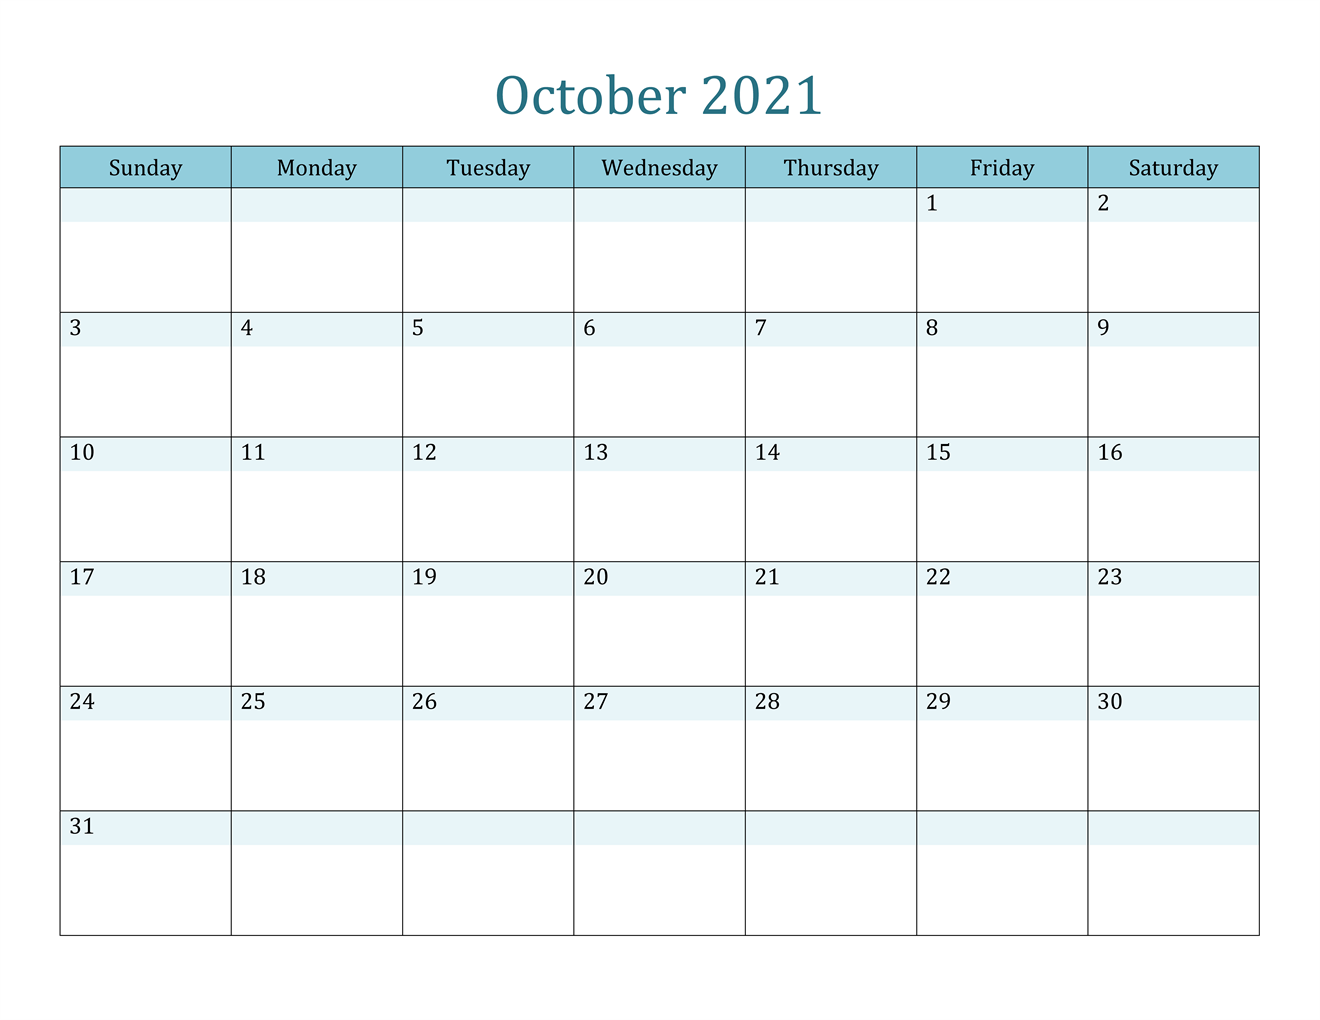 October 2021 Calendar Blank Portrait Orientation